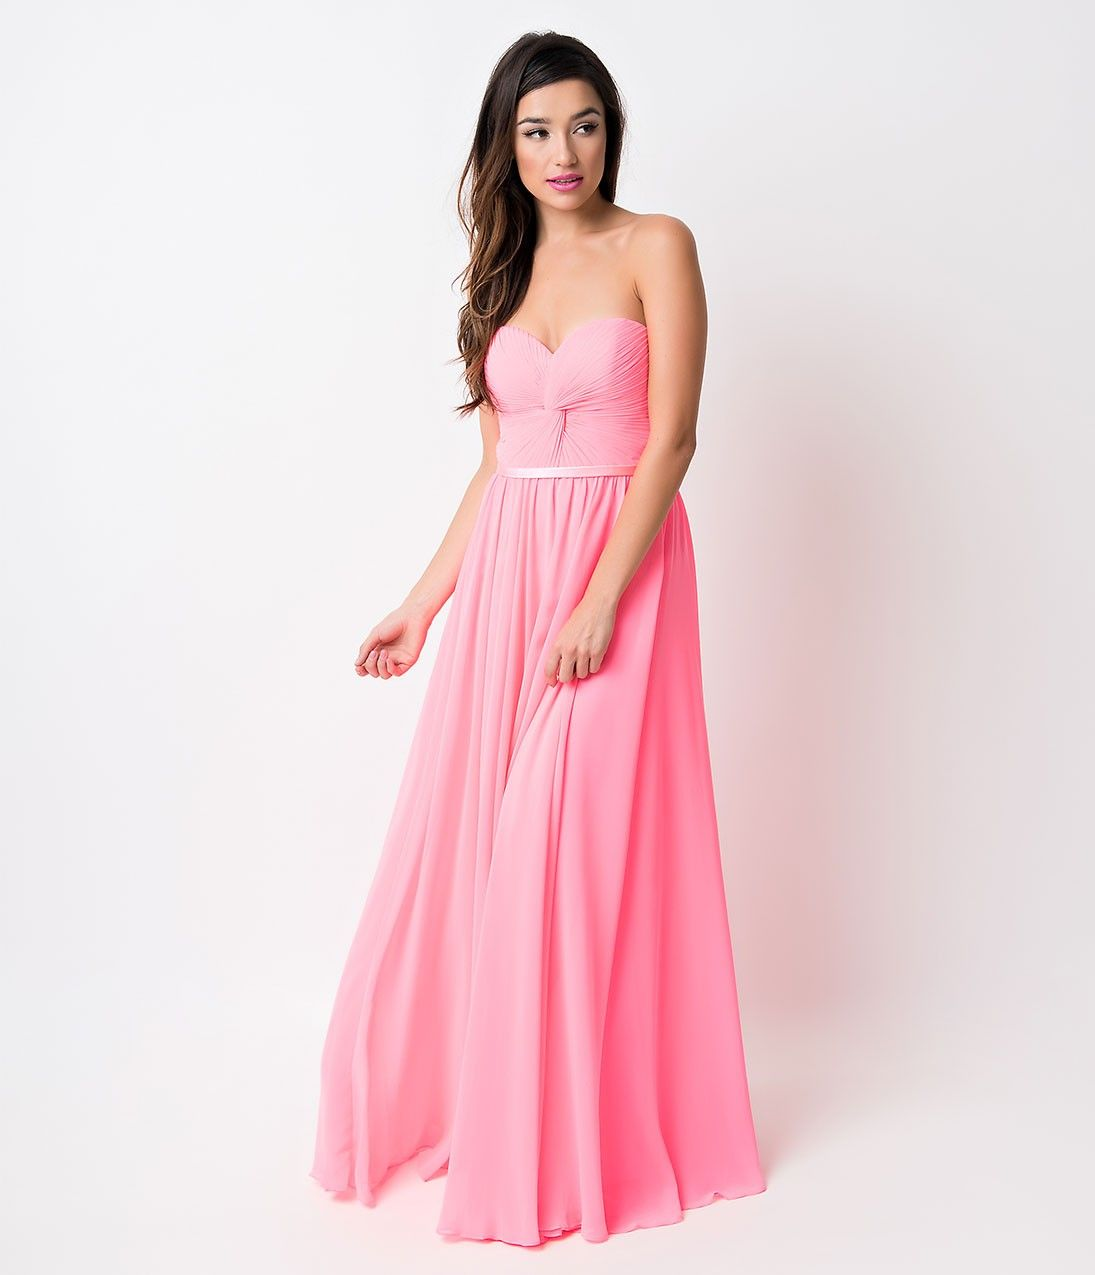 Neon fuchsia chiffon strapless sweetheart corset long prom gown